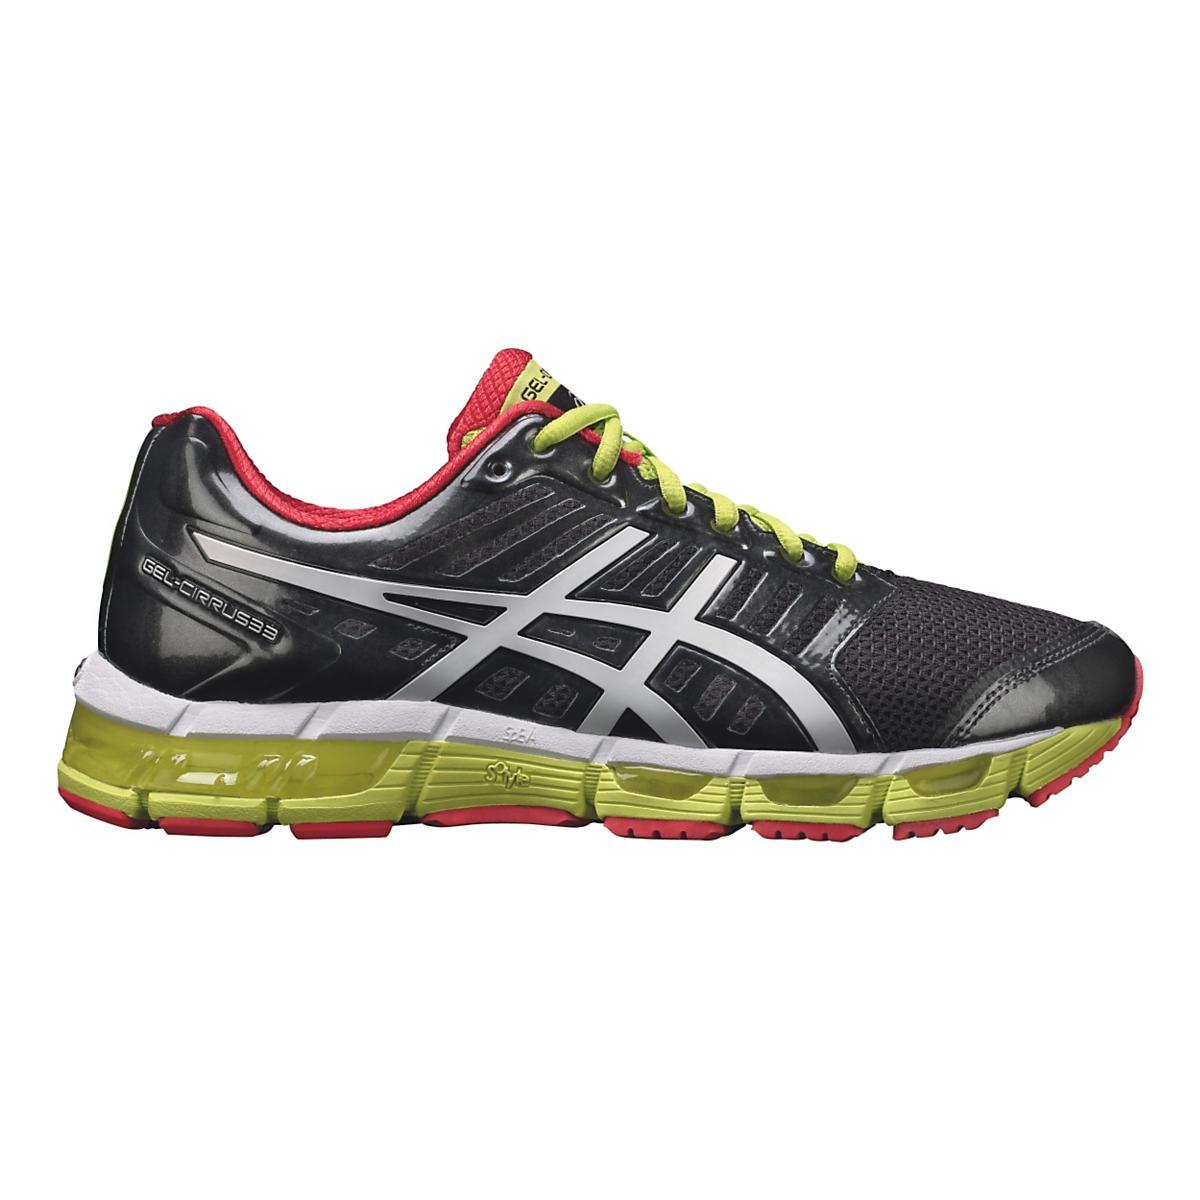 e909b2e8b704 Mens ASICS GEL-Cirrus33 Running Shoe at Road Runner Sports